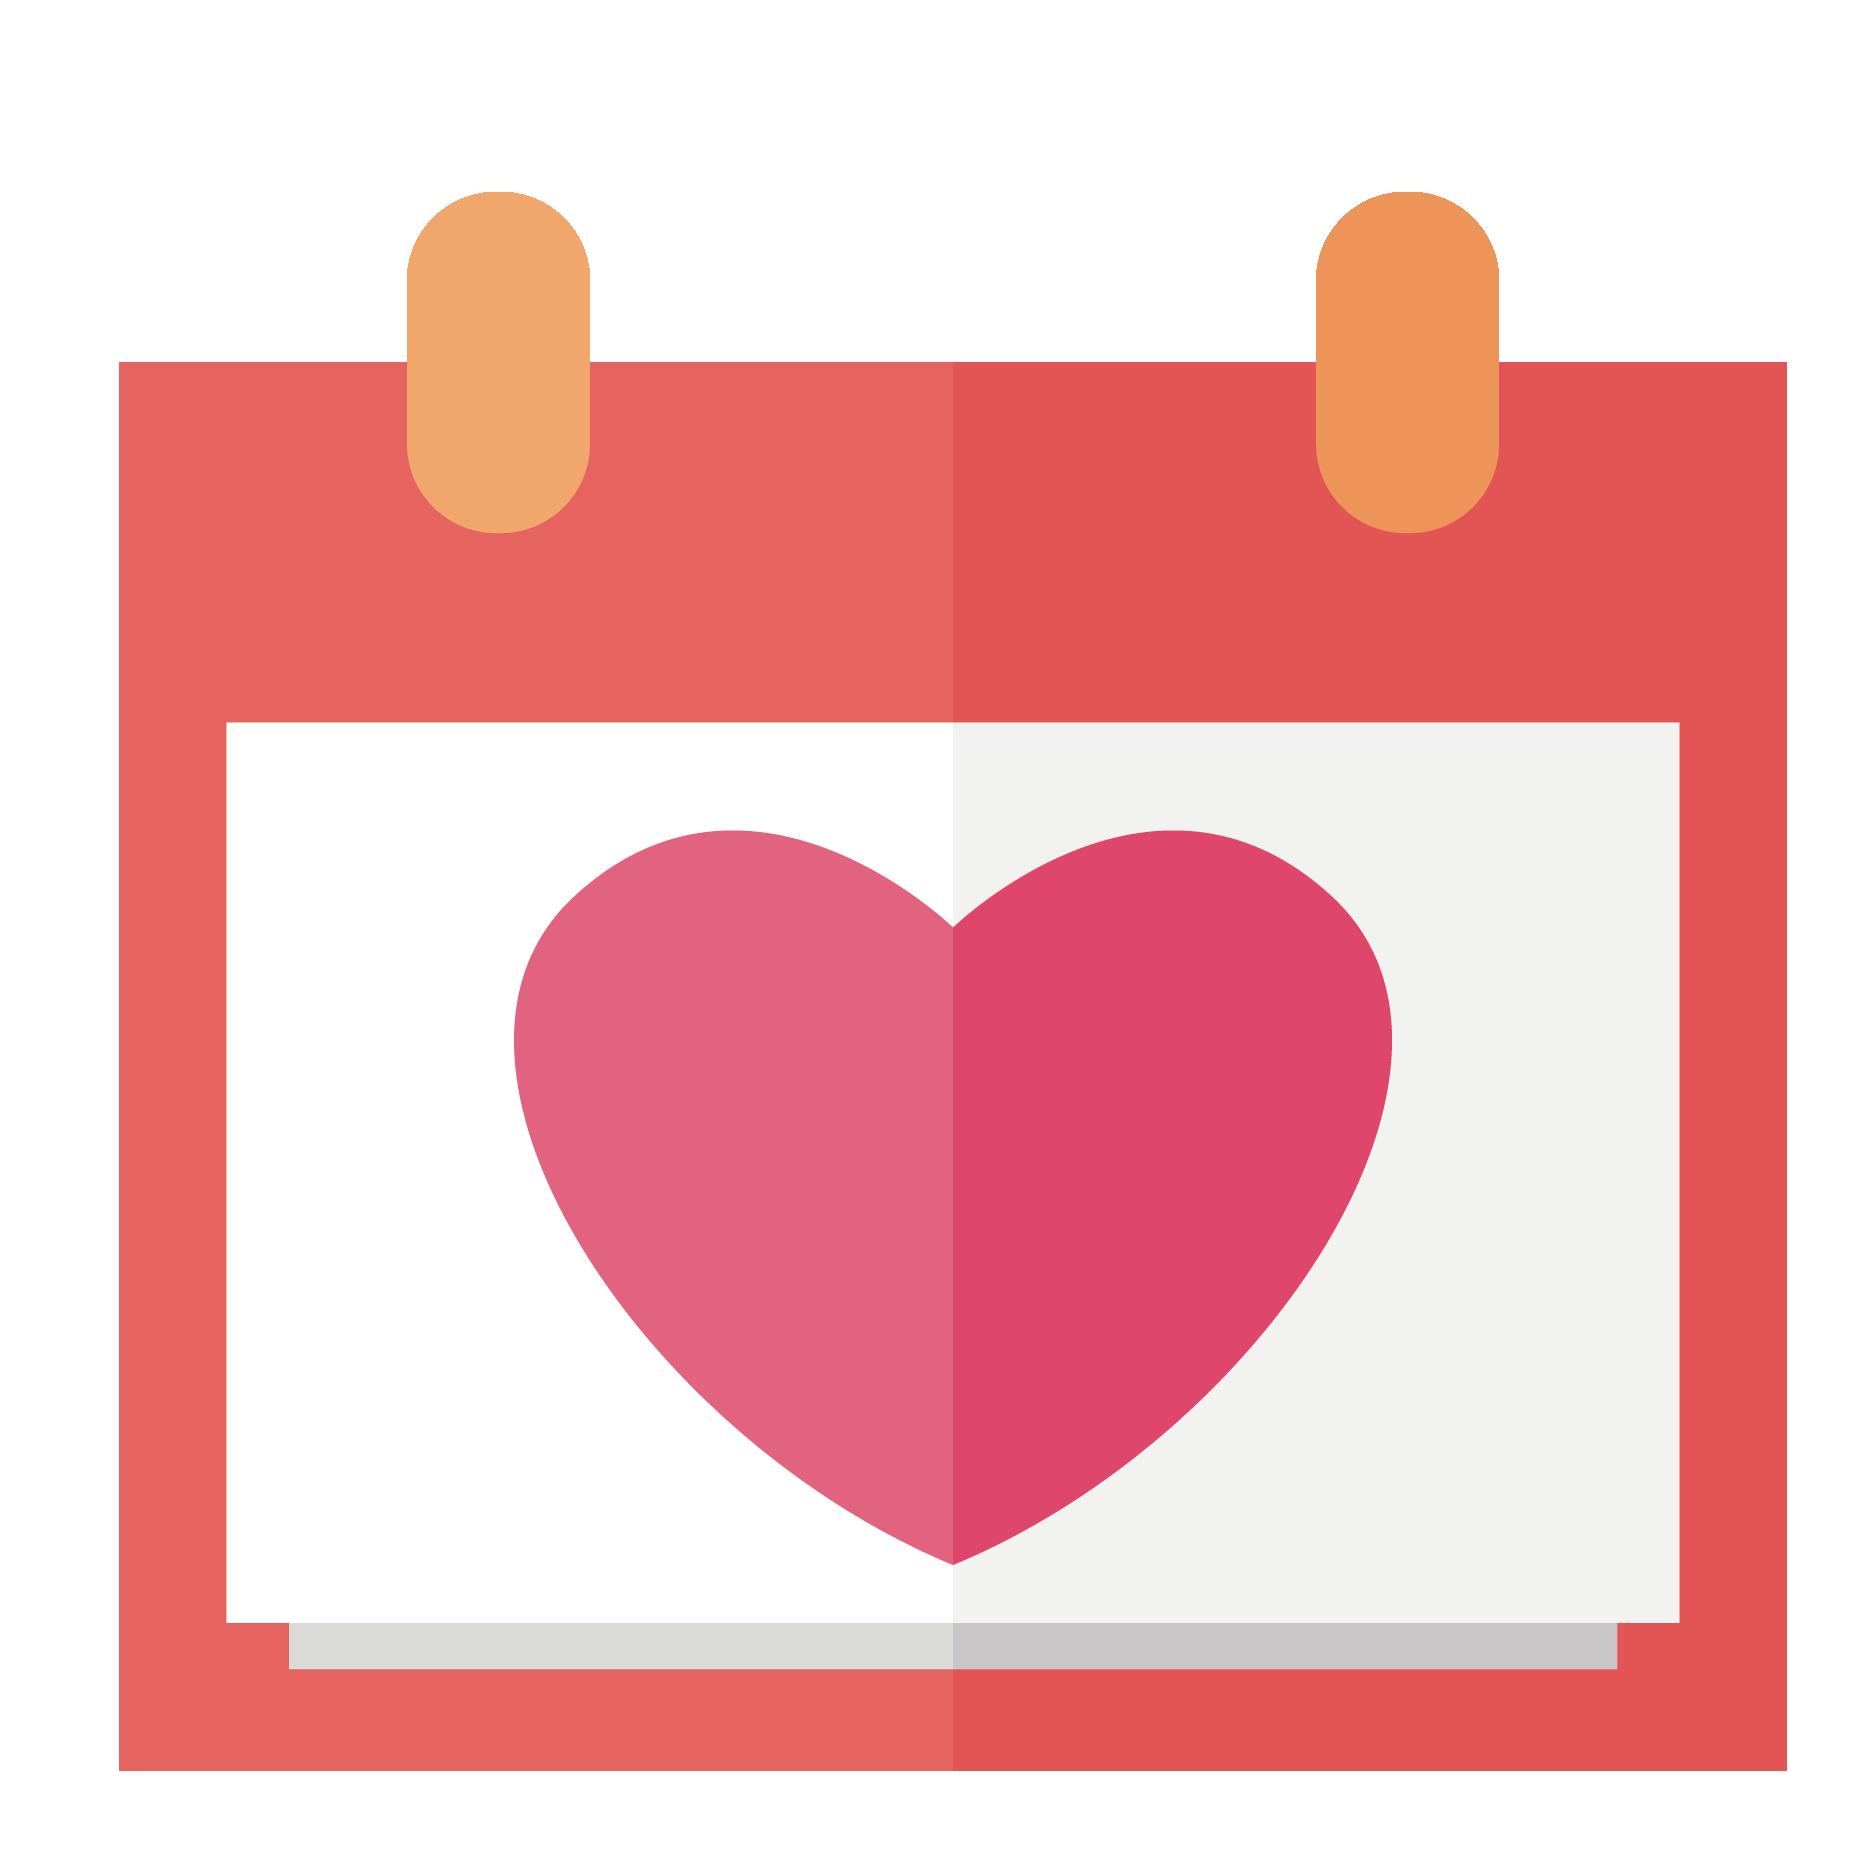 Heart clipart donut. Euclidean vector clip art